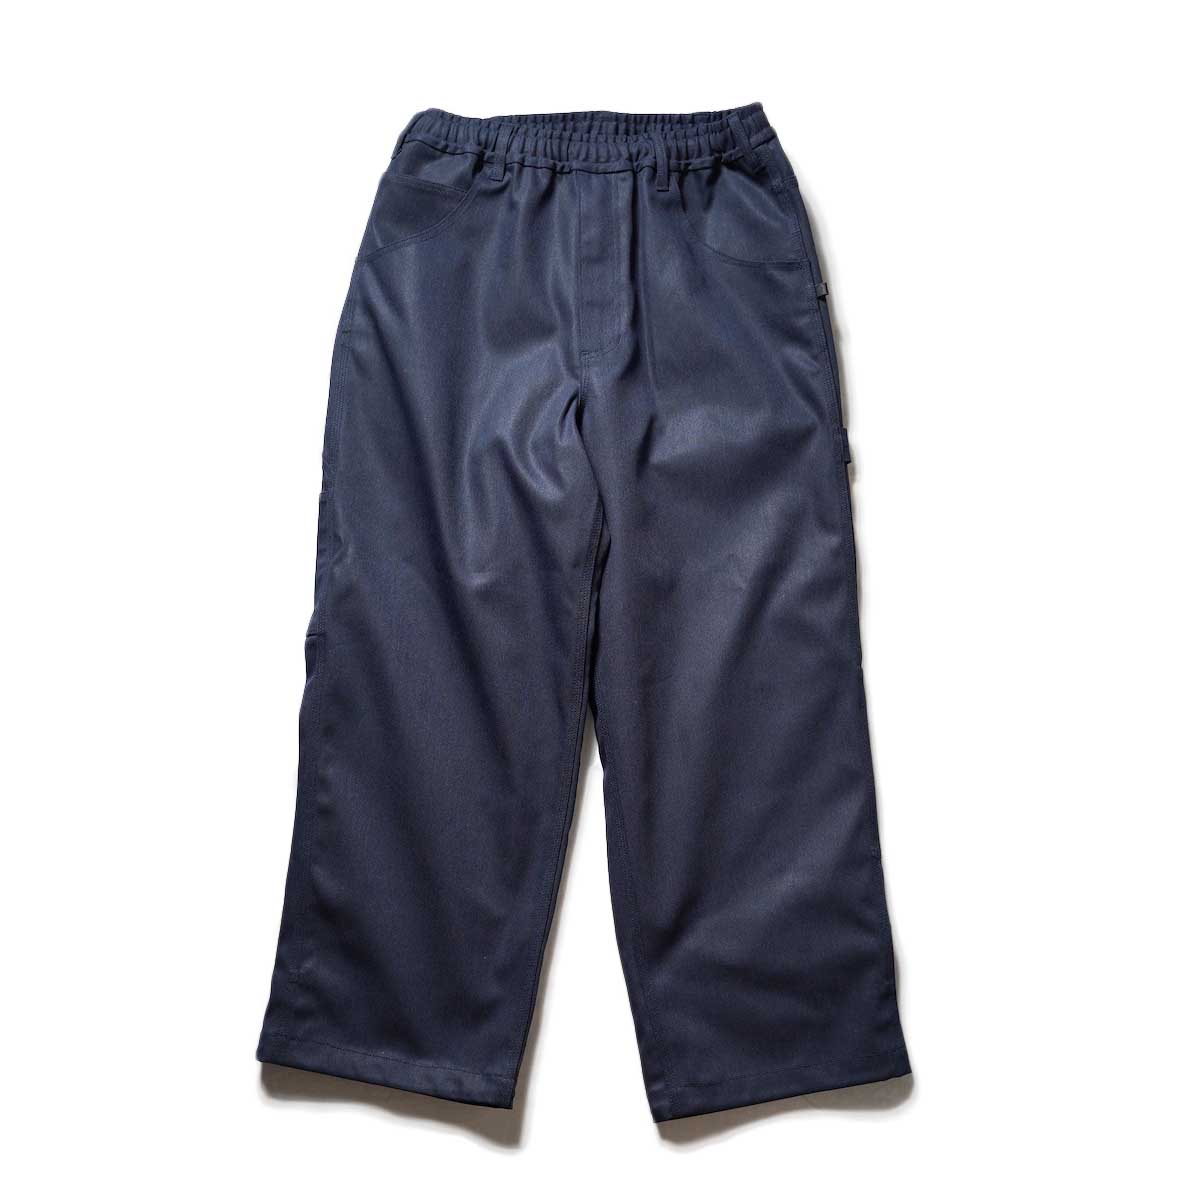 DAIWA PIER39 / TECH DEIM WORKERS PANTS (Navy)